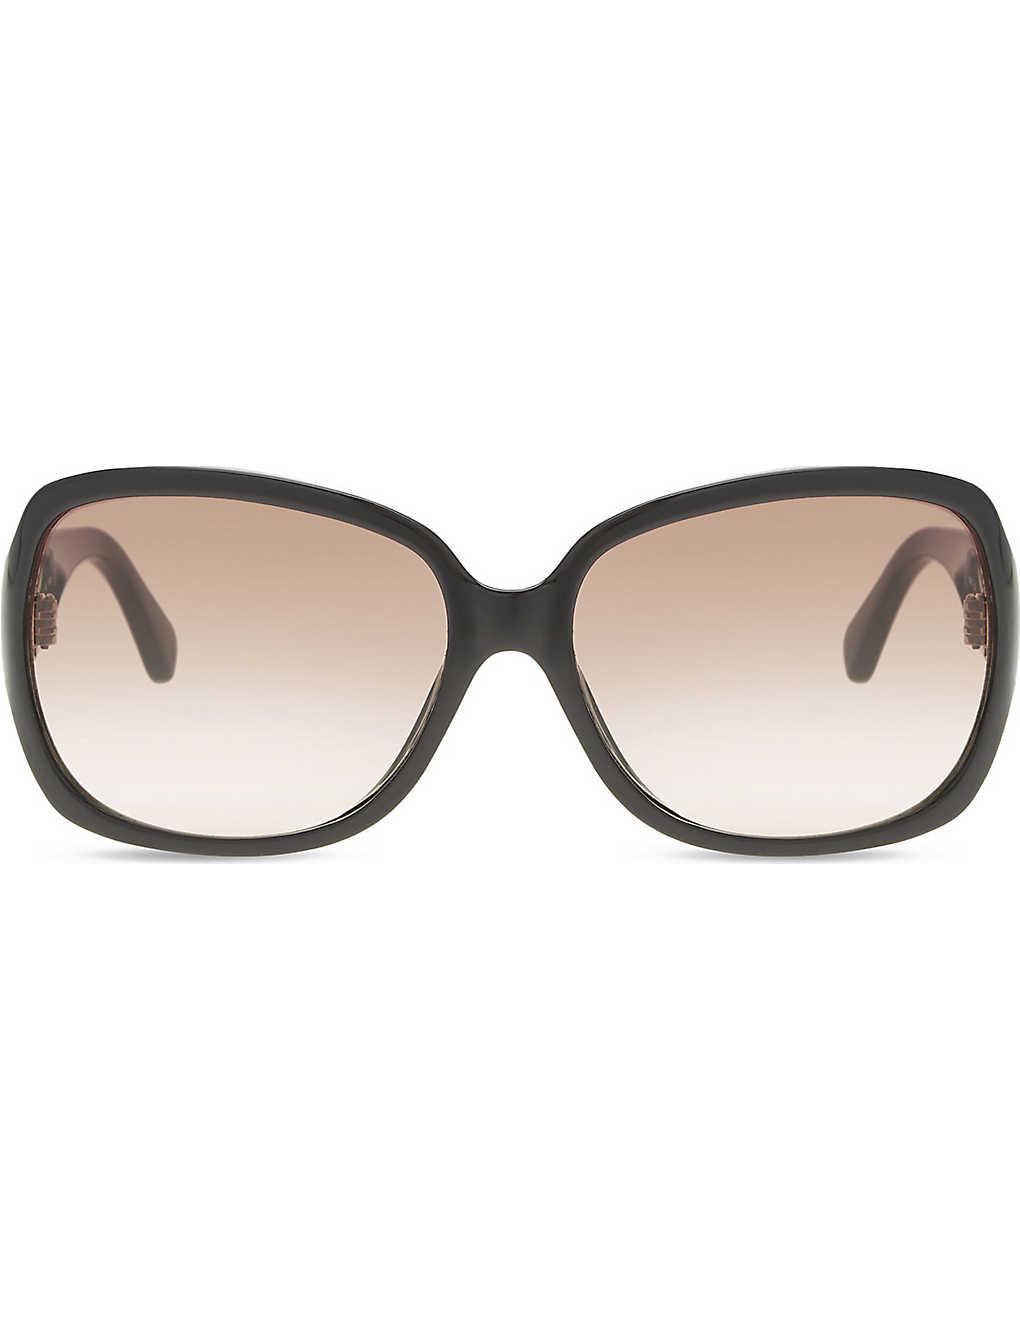 a79b41ef73 MICHAEL KORS - M2890s Angela square-frame sunglasses